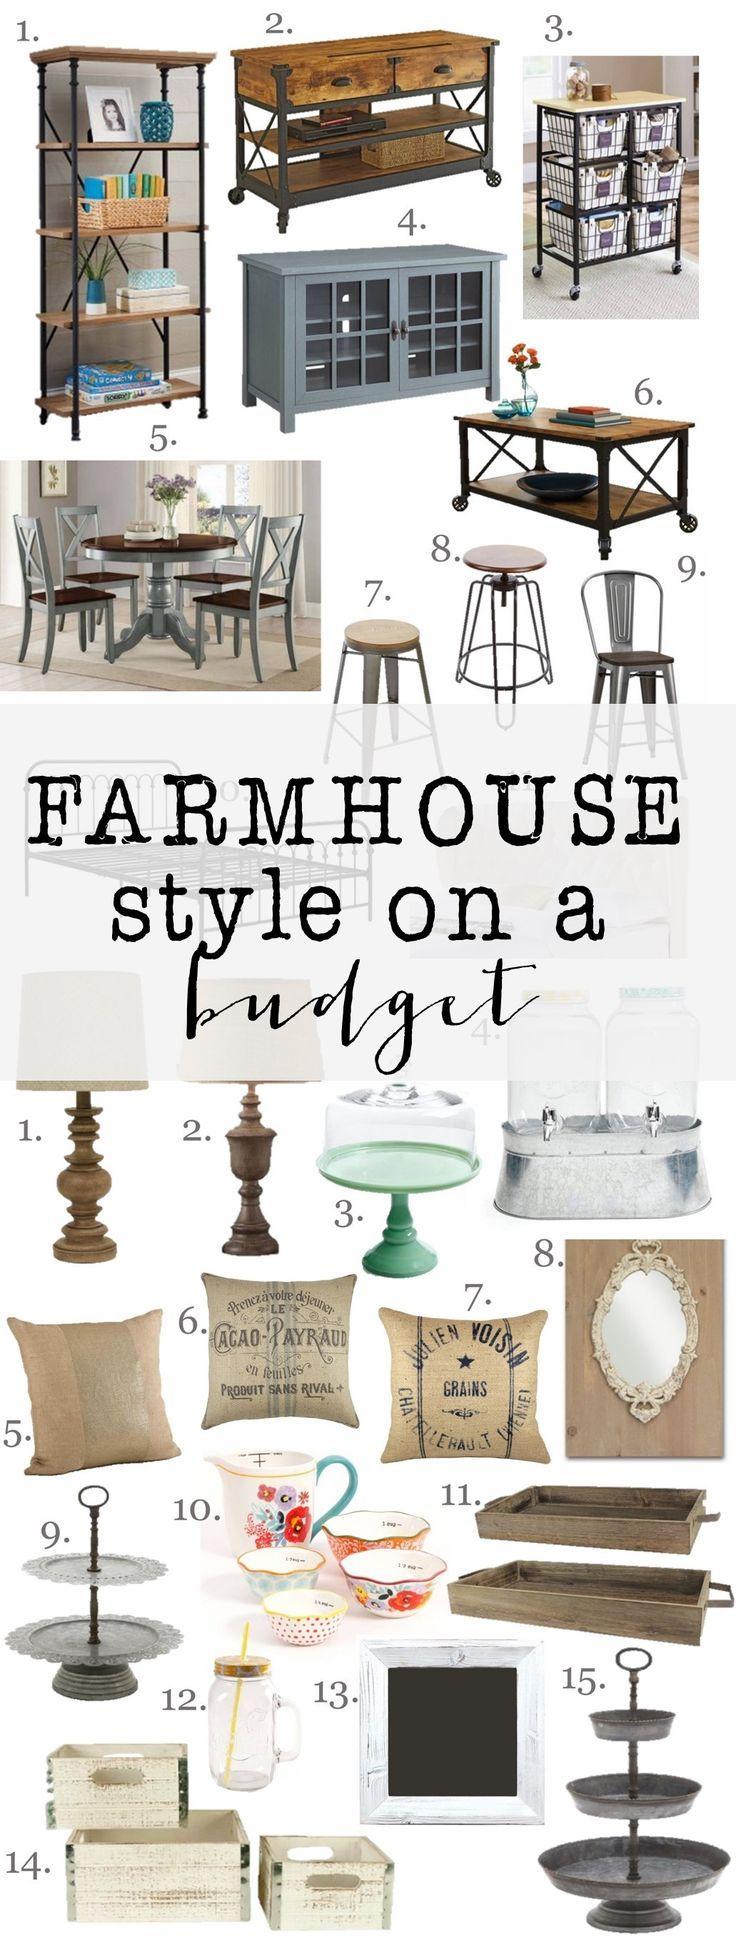 Farmhouse Style on a budget | Farmhouse | Pinterest | Deko shop ...